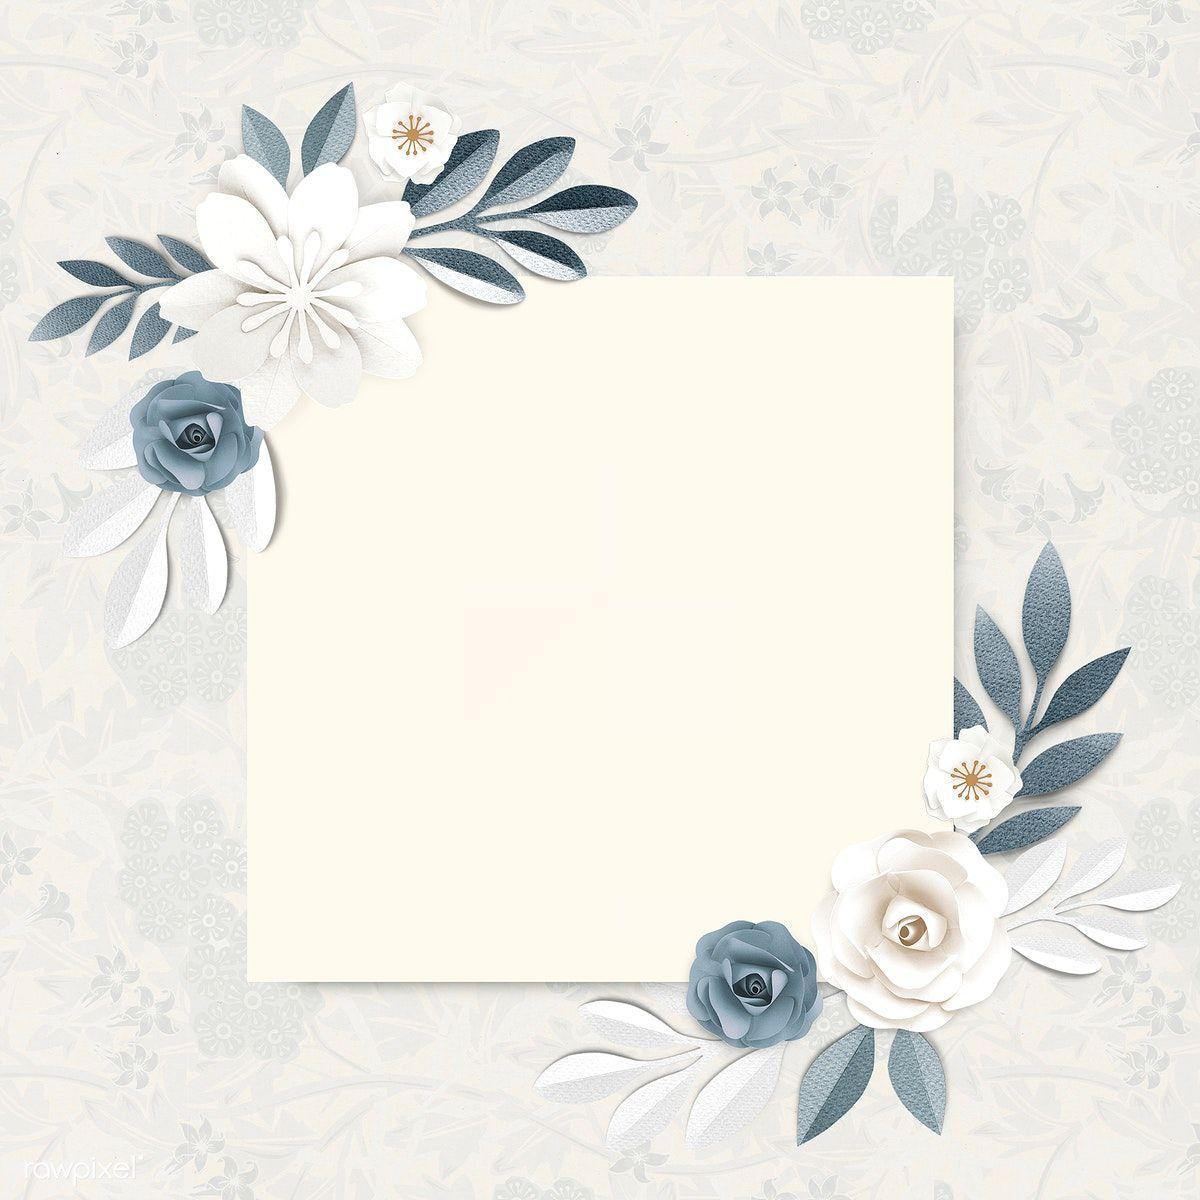 Download Premium Psd Of Square Paper Craft Flower Frame Template Flower Frame Frame Template Tumblr Flower